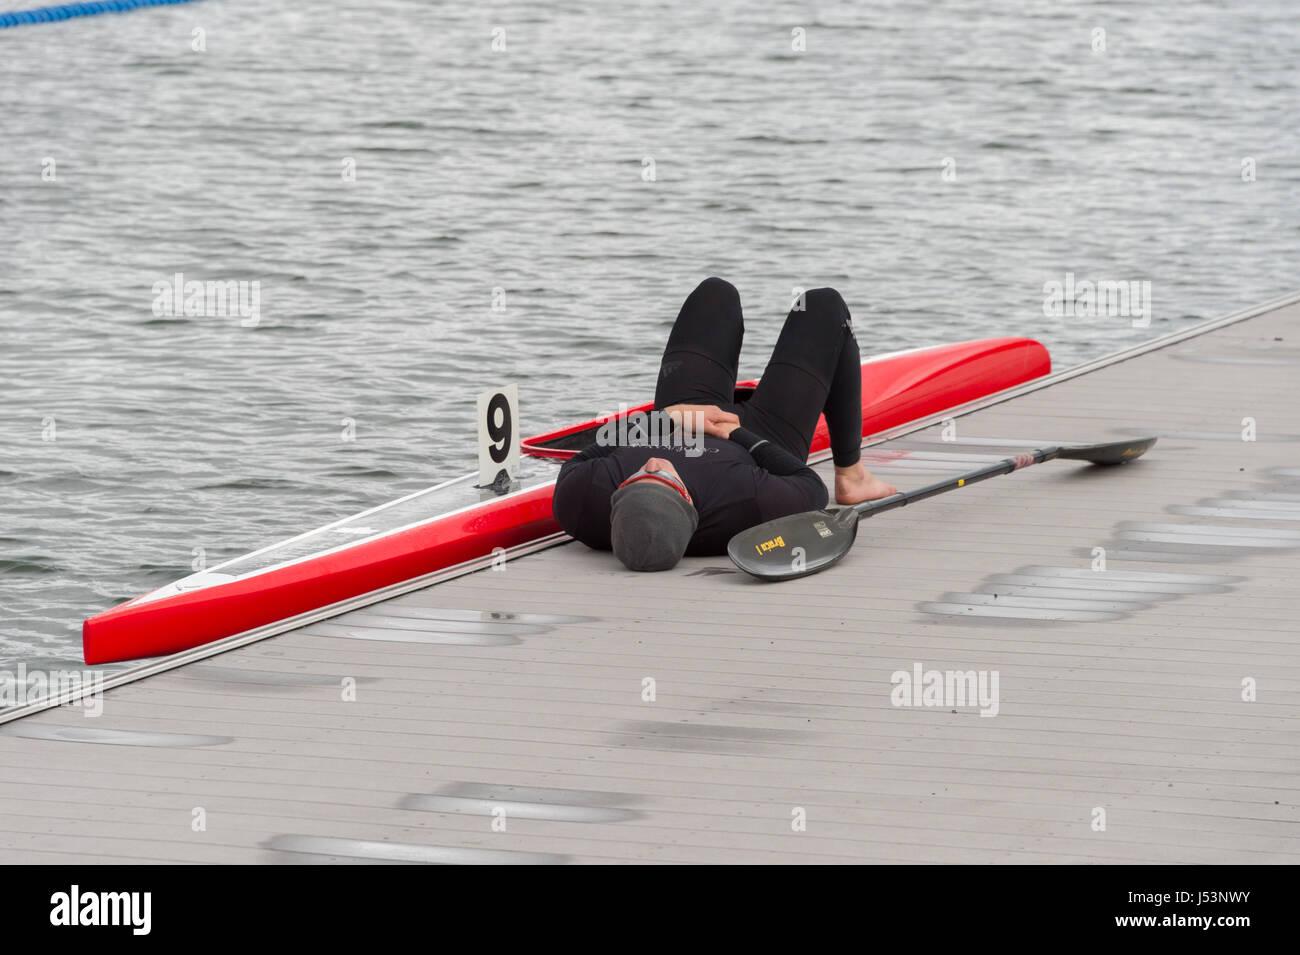 Montreal, CA - 14. Mai 2017: kanadische Sprint Seniorenmannschaft Studien am Olympischen Beckens Stockbild